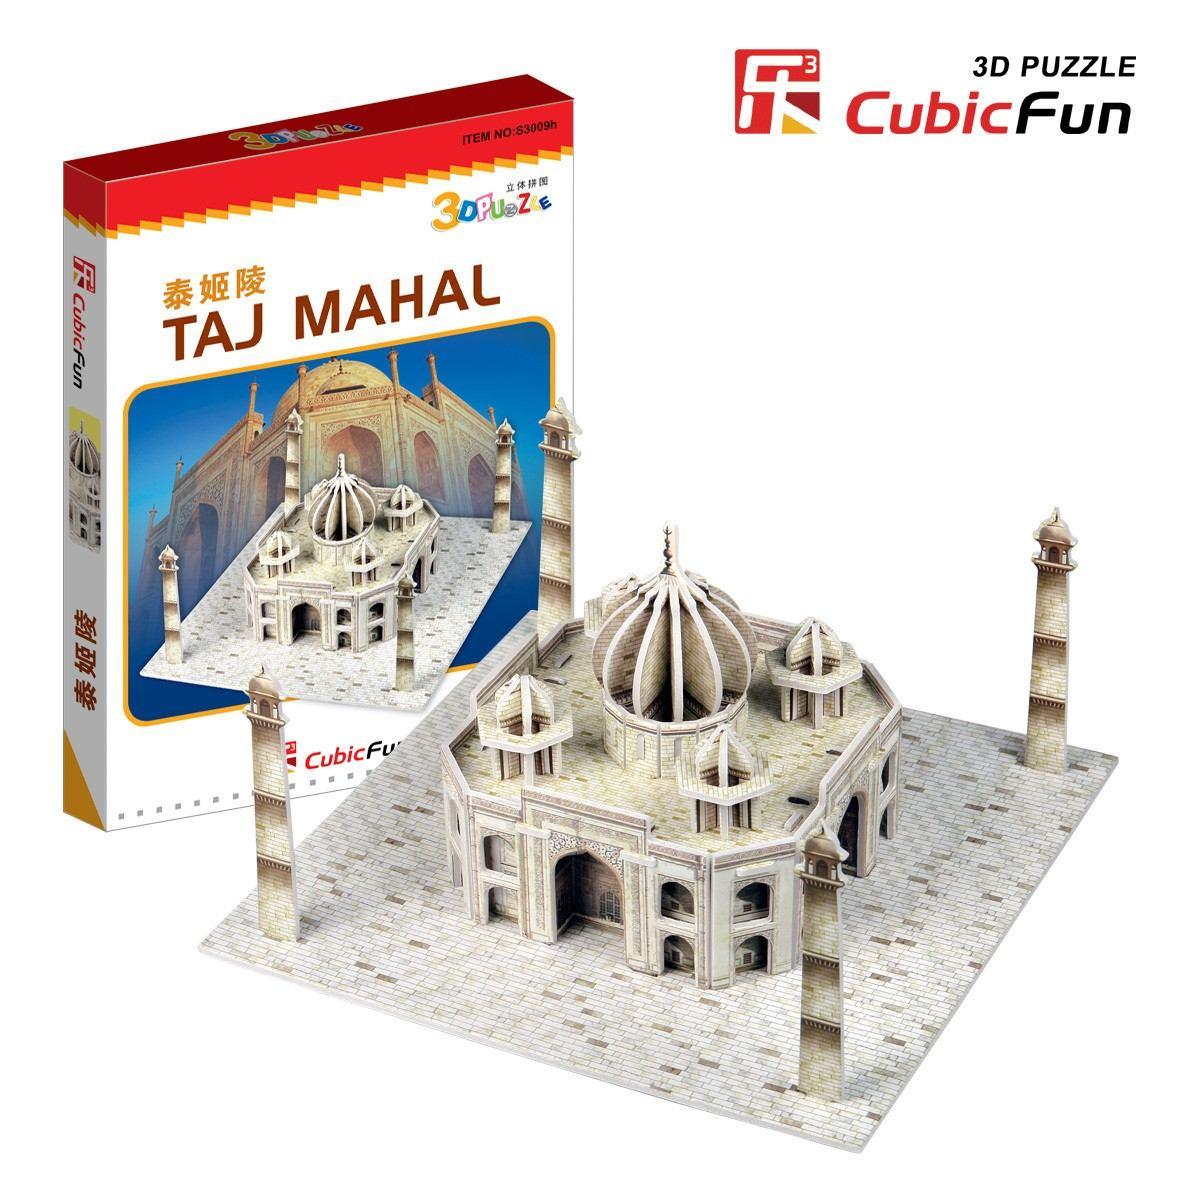 3D Mini Series Puzzle- India : Taj Mahal (Difficulty 2/8)